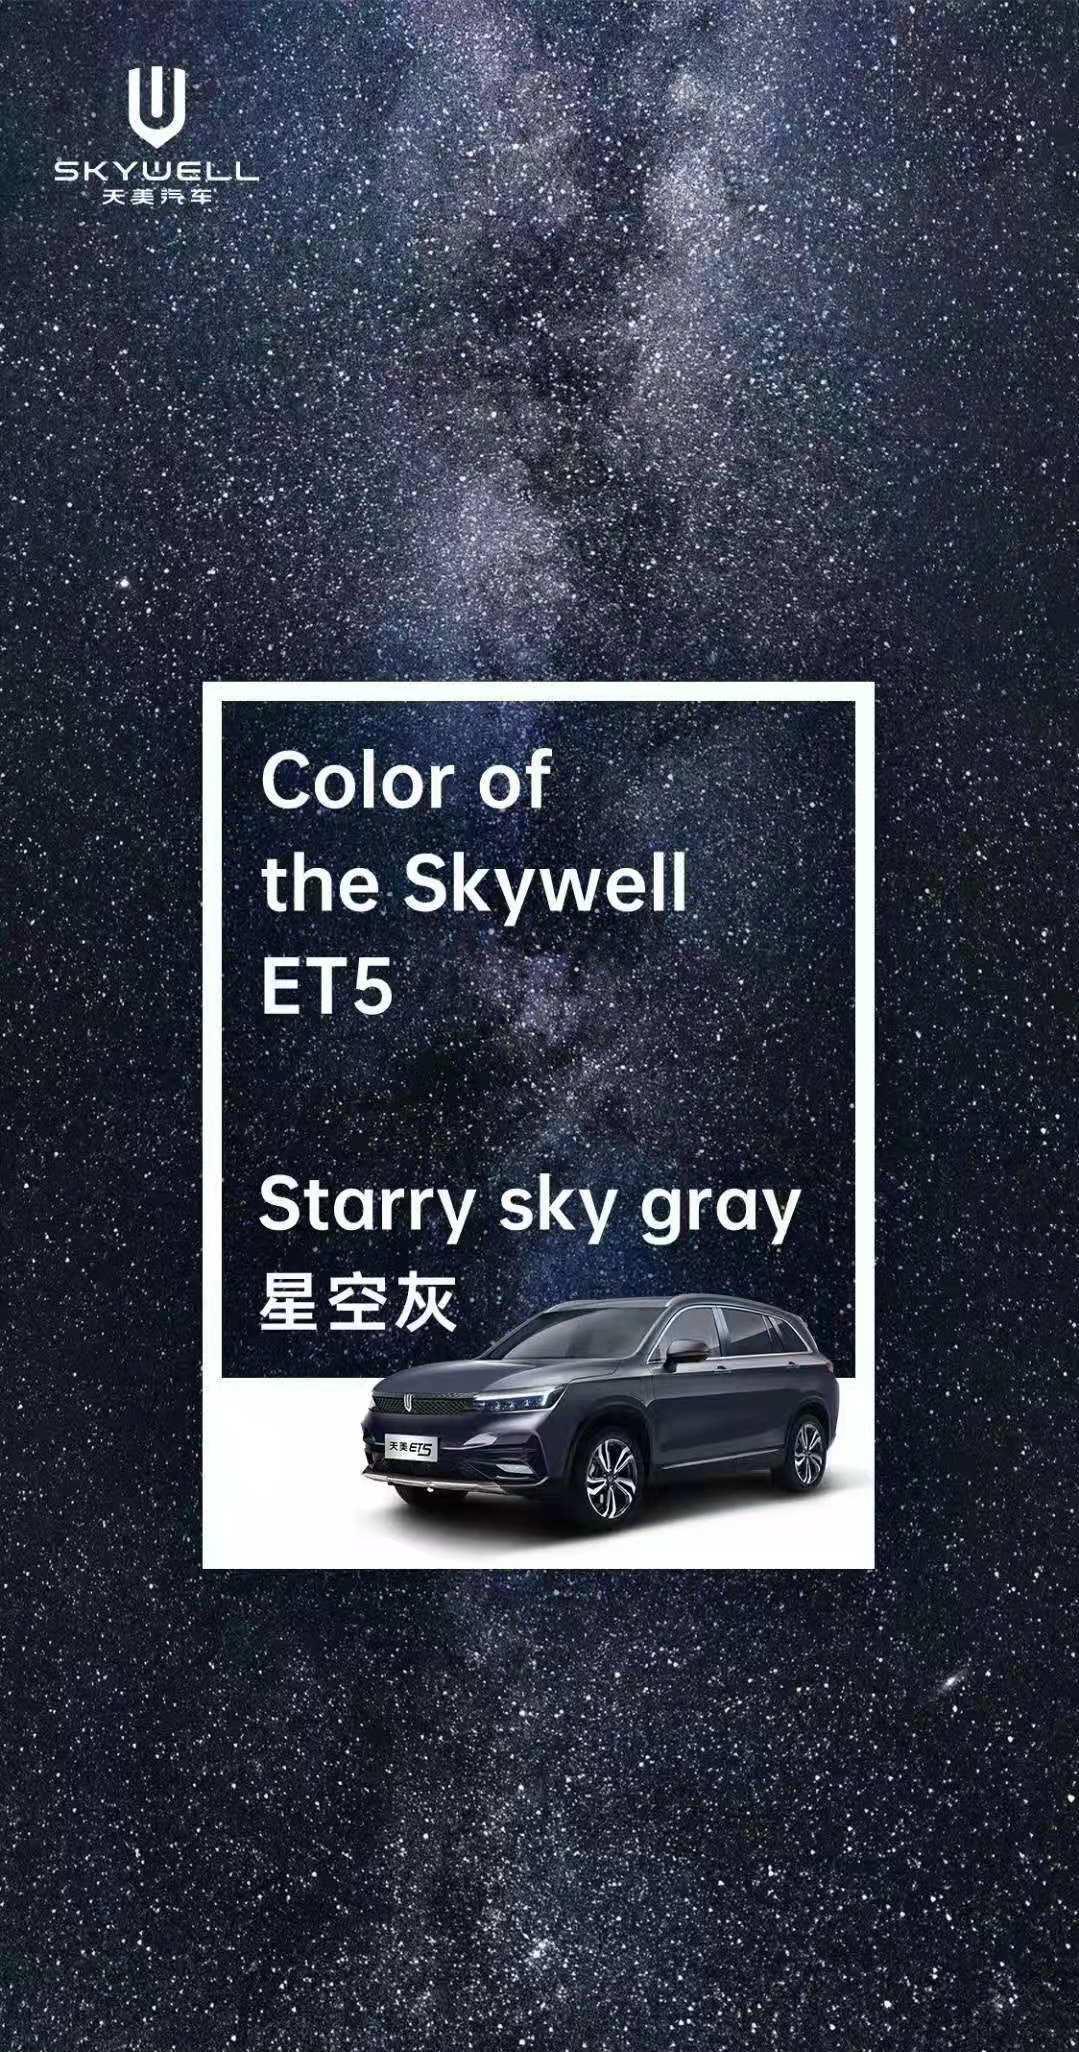 starry sky gray ET5